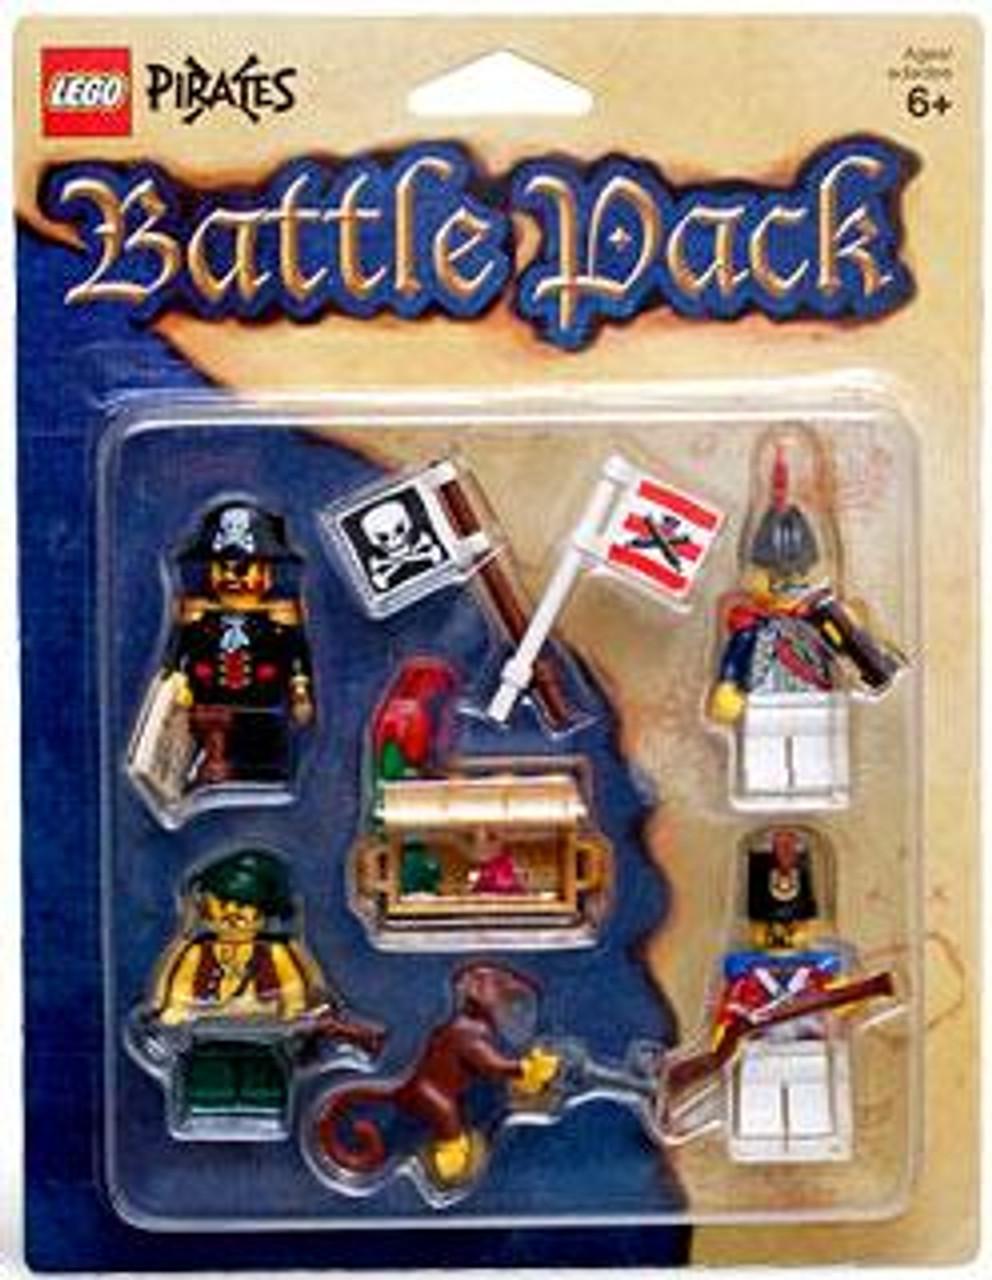 LEGO Pirates Battle Pack Set #852747